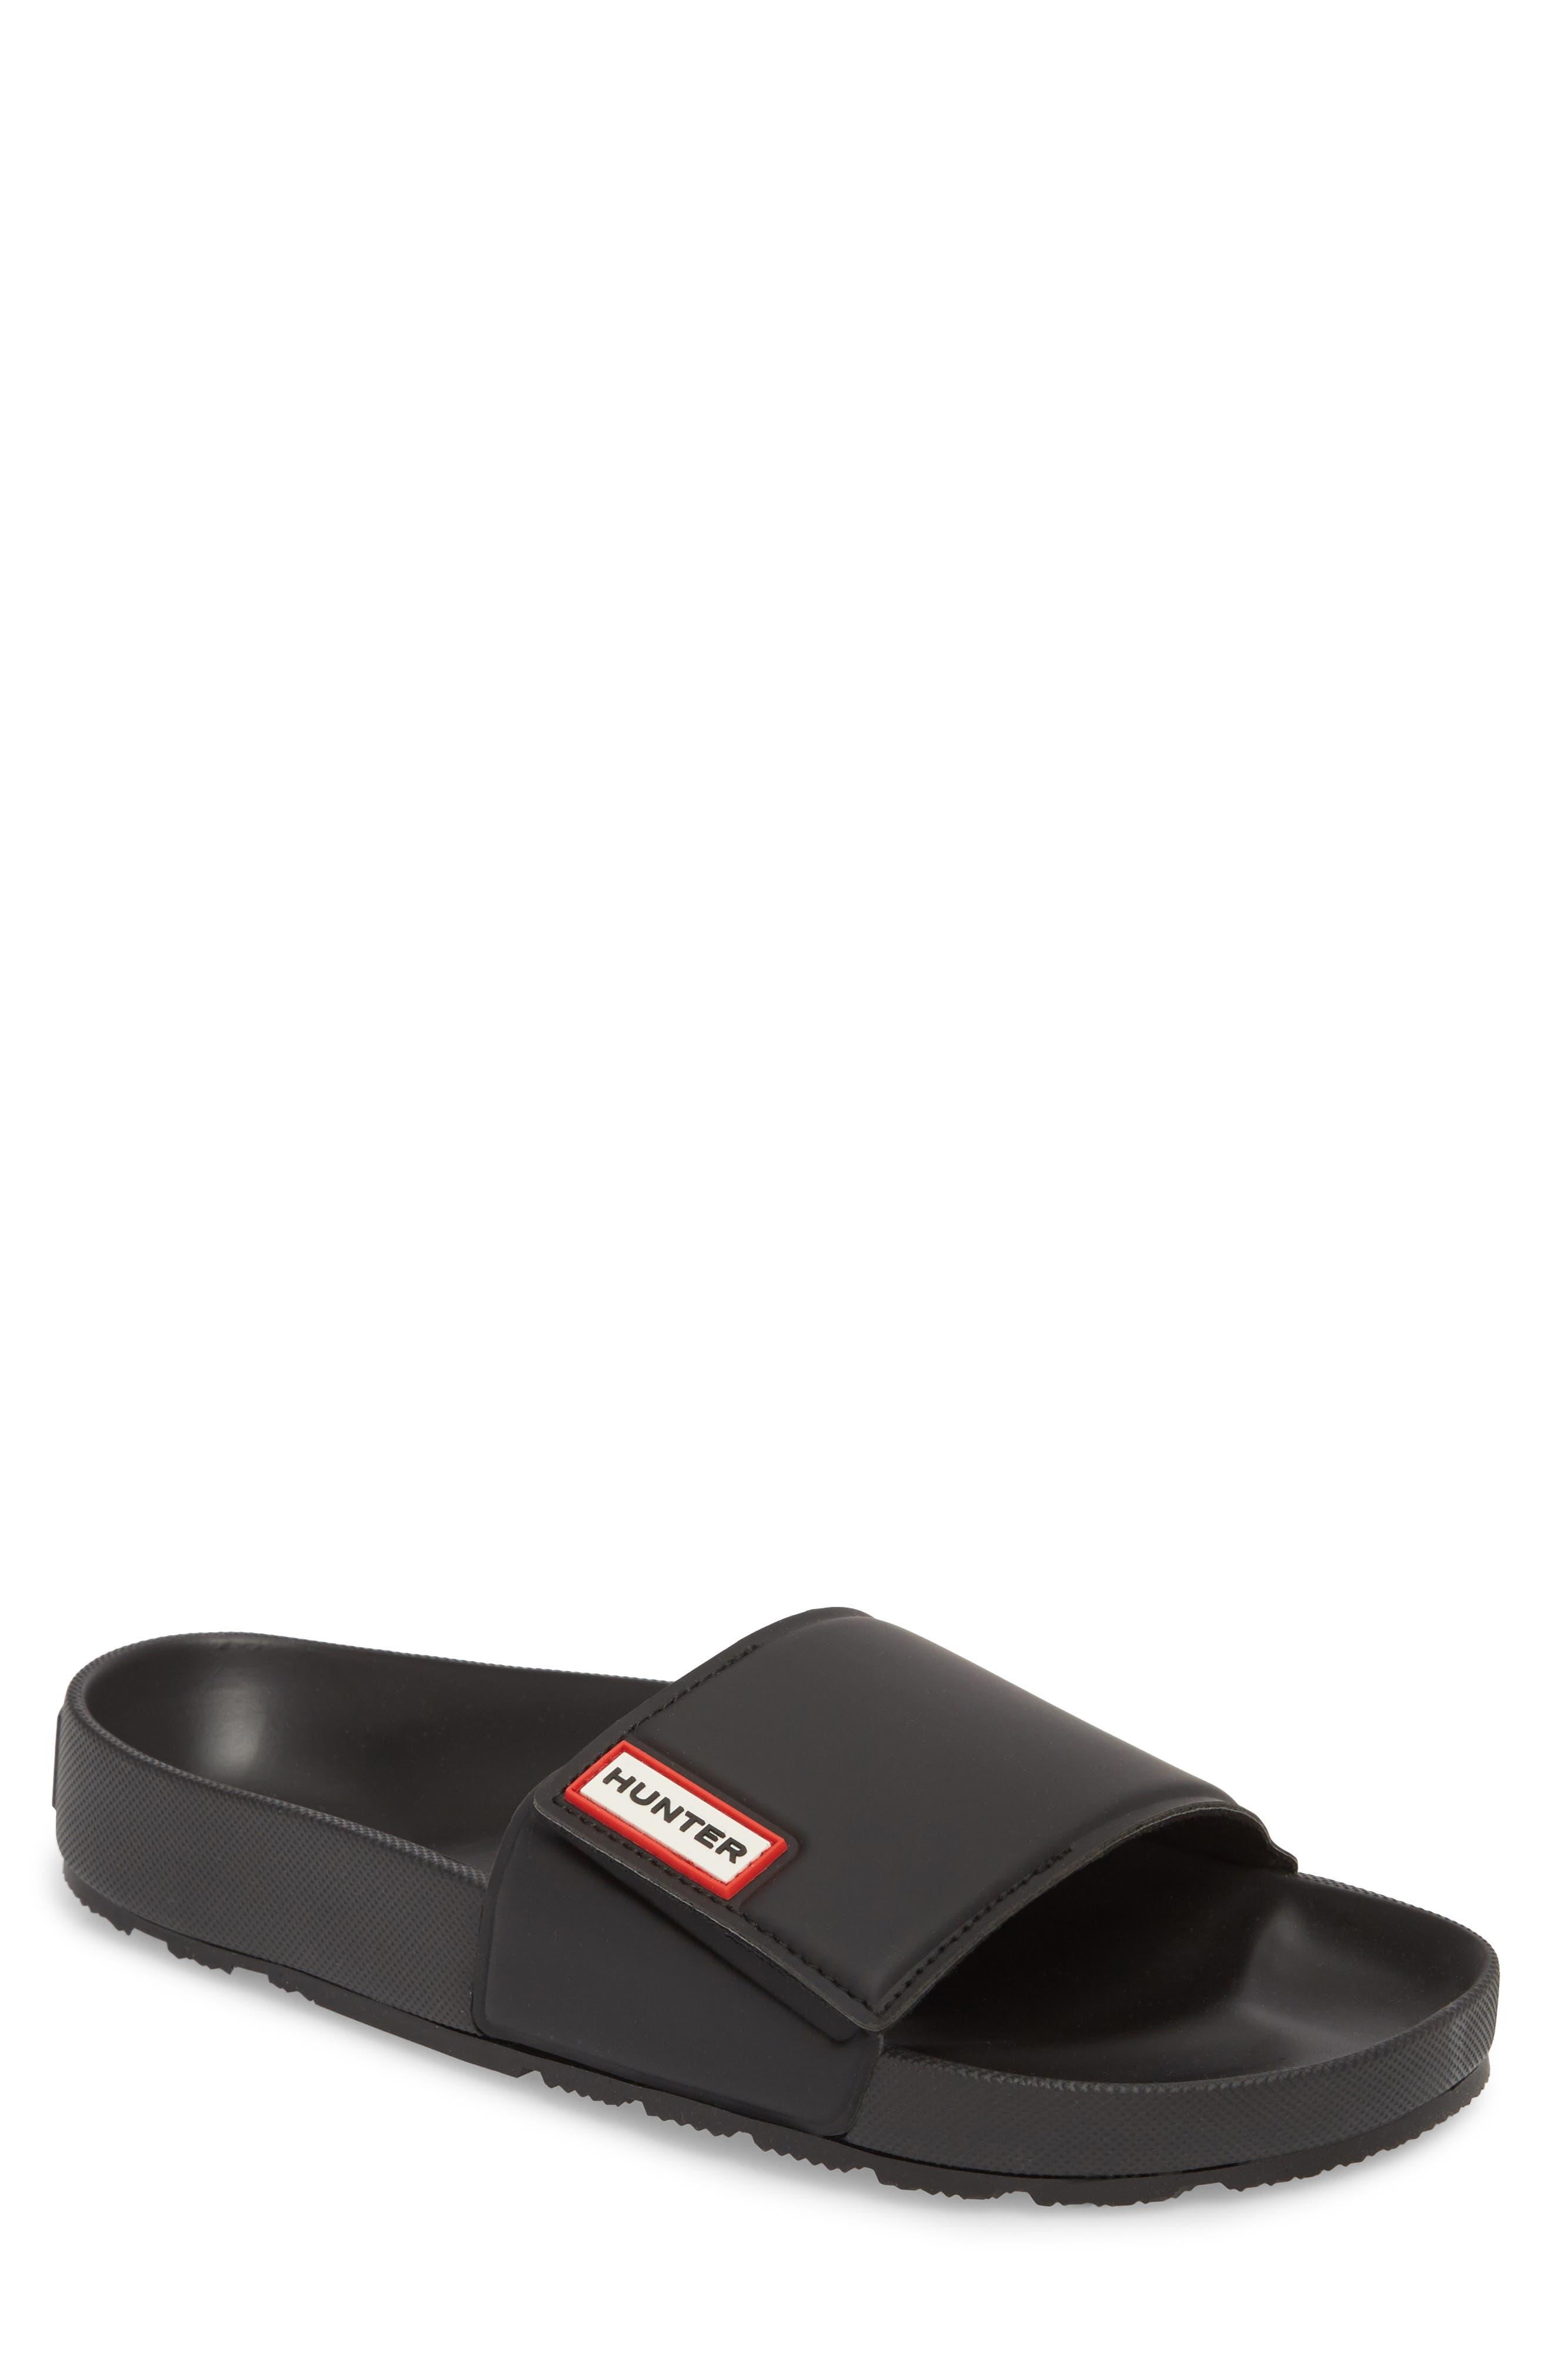 Original Adjustable Slide Sandal,                             Main thumbnail 1, color,                             BLACK